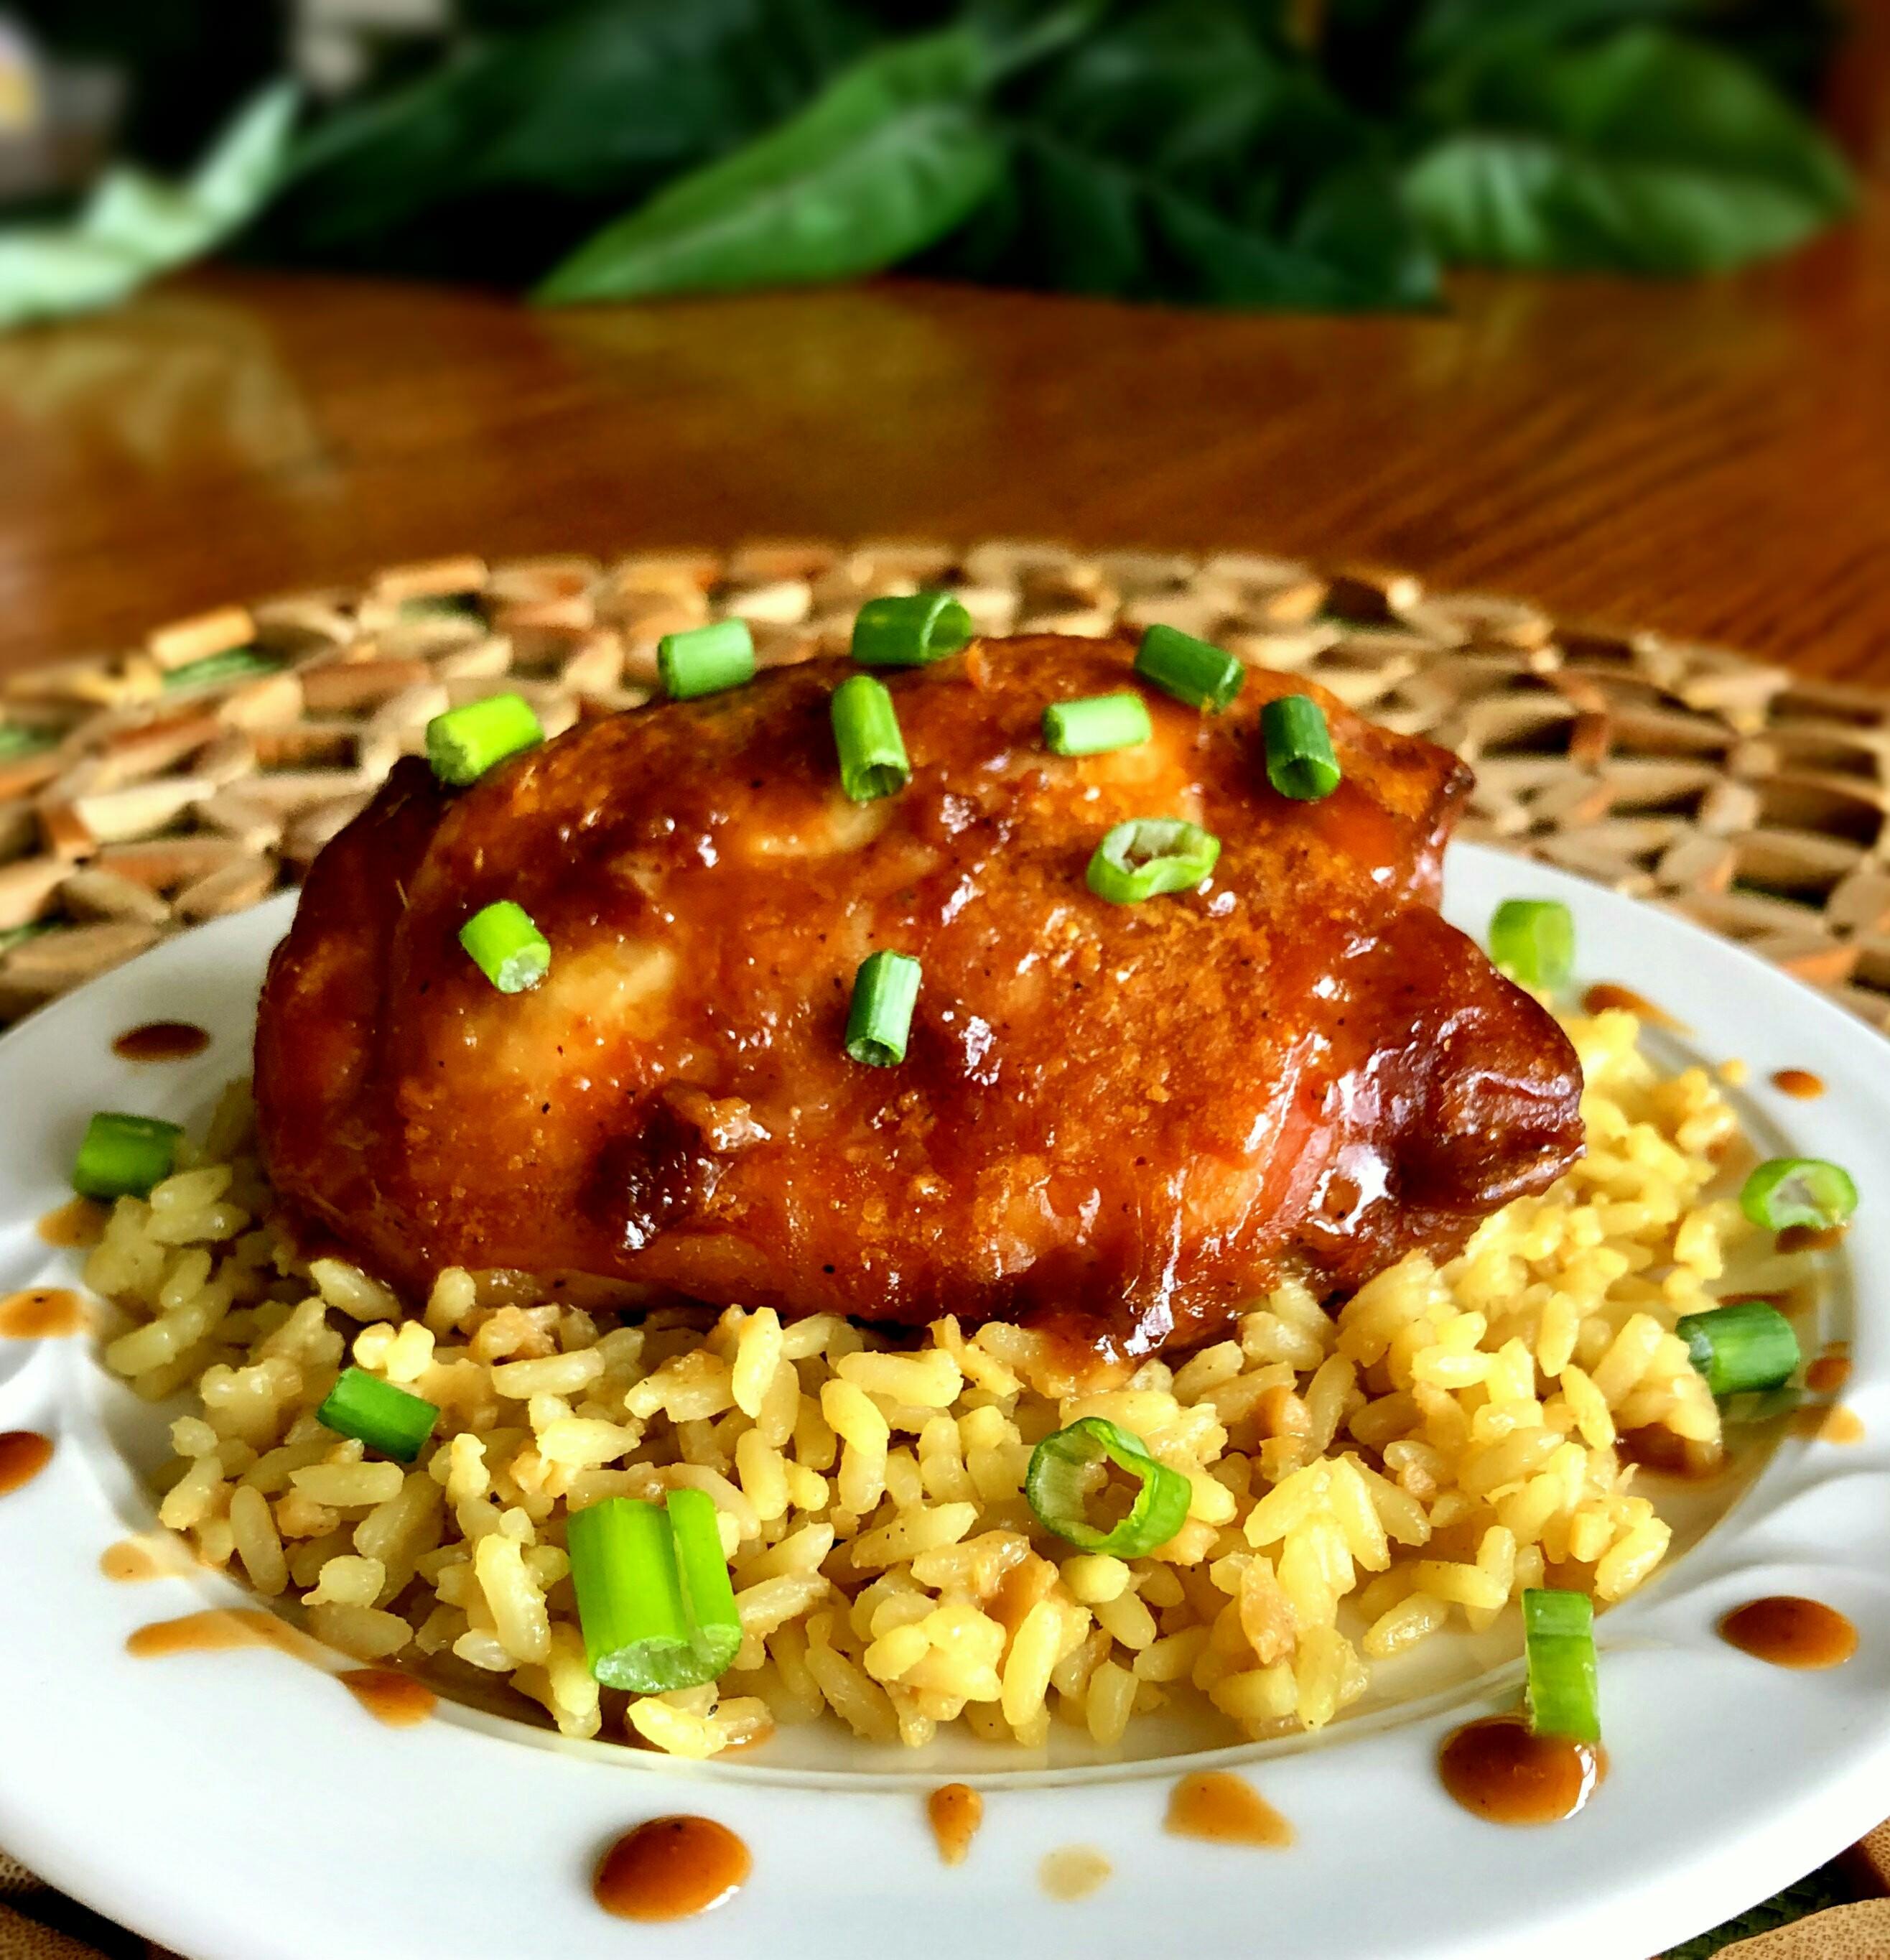 Spicy Honey-Peanut Baked Chicken Thighs Yoly